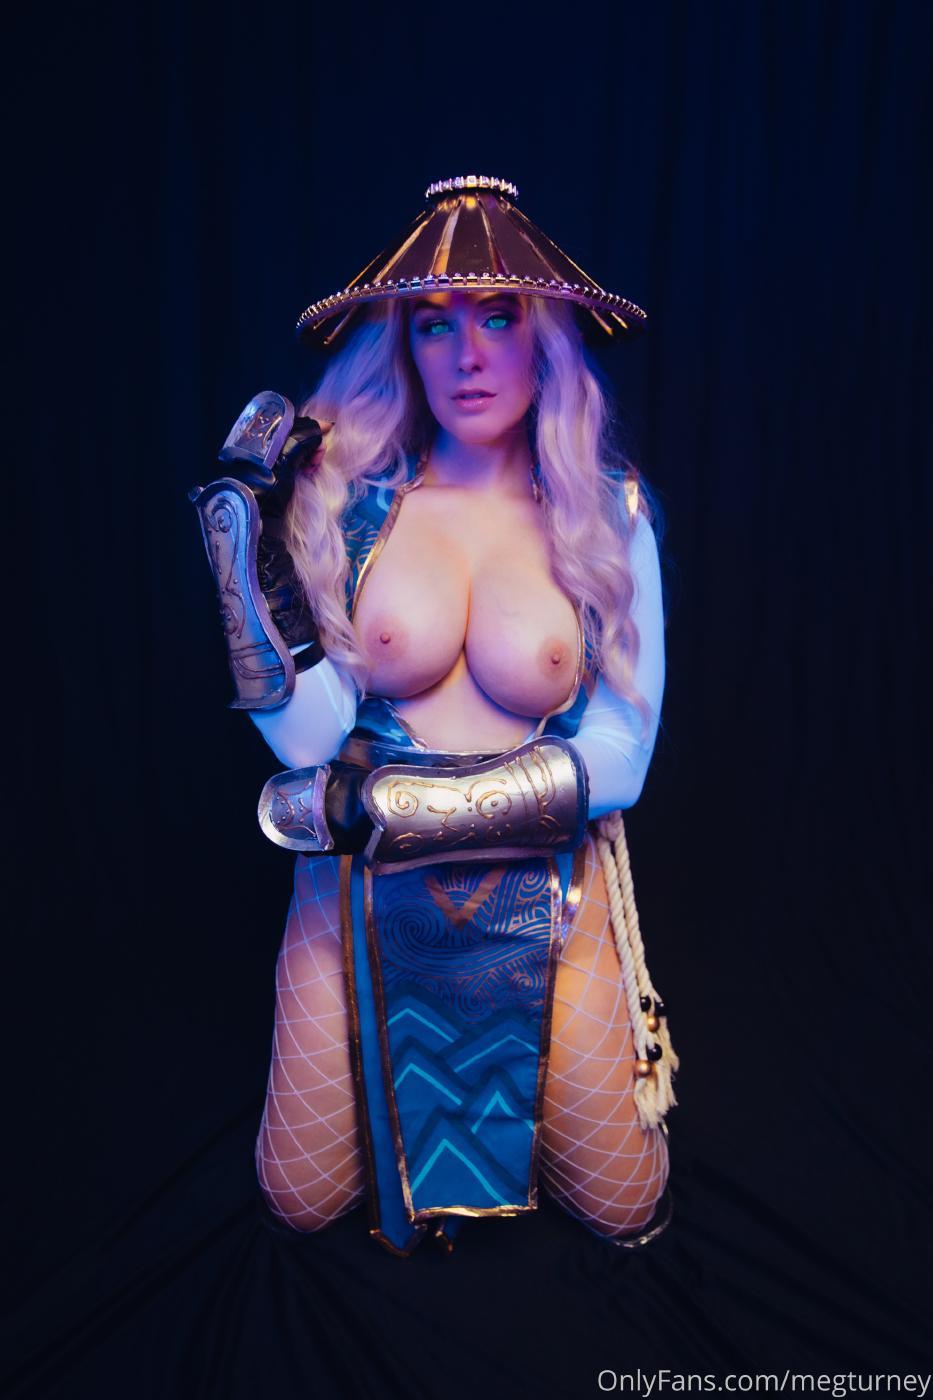 Meg Turney Lord Raiden Topless Onlyfans Set Leaked